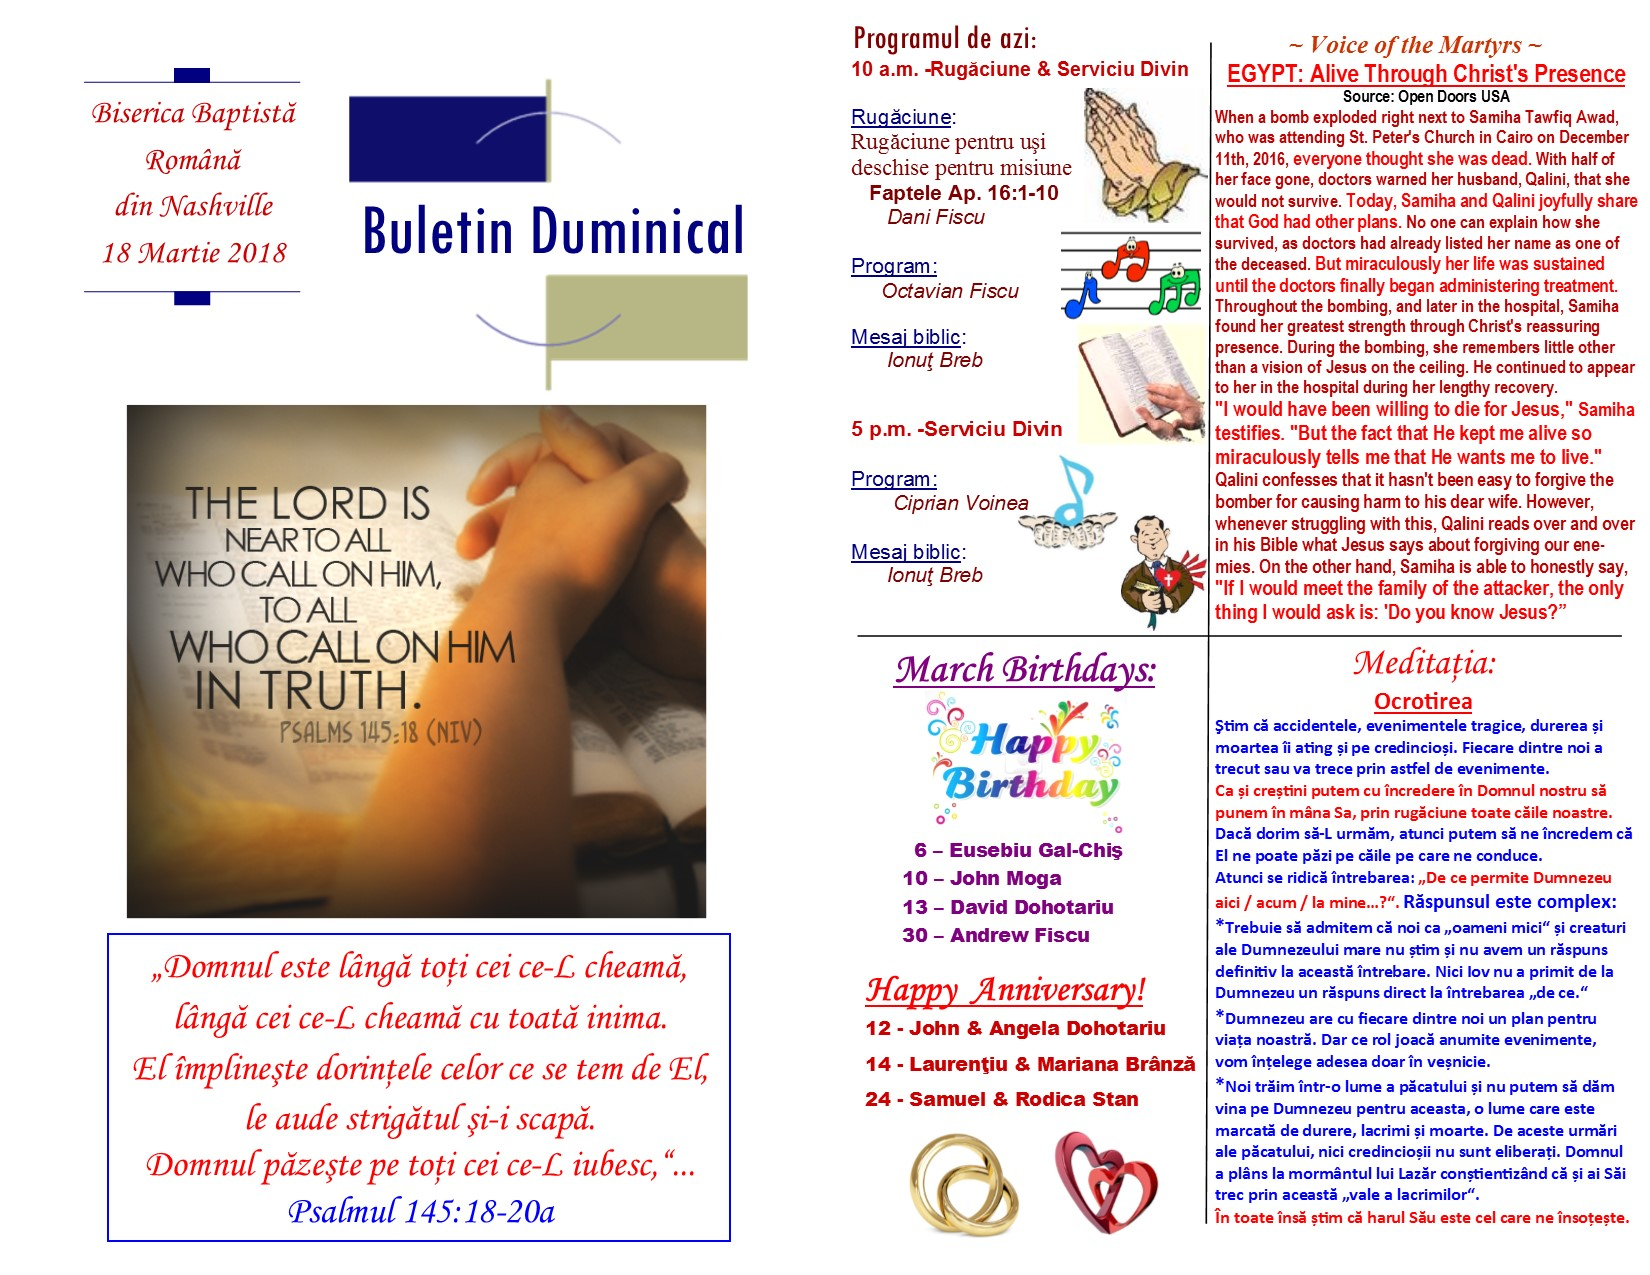 Buletin 03-18-18 page 1 & 2